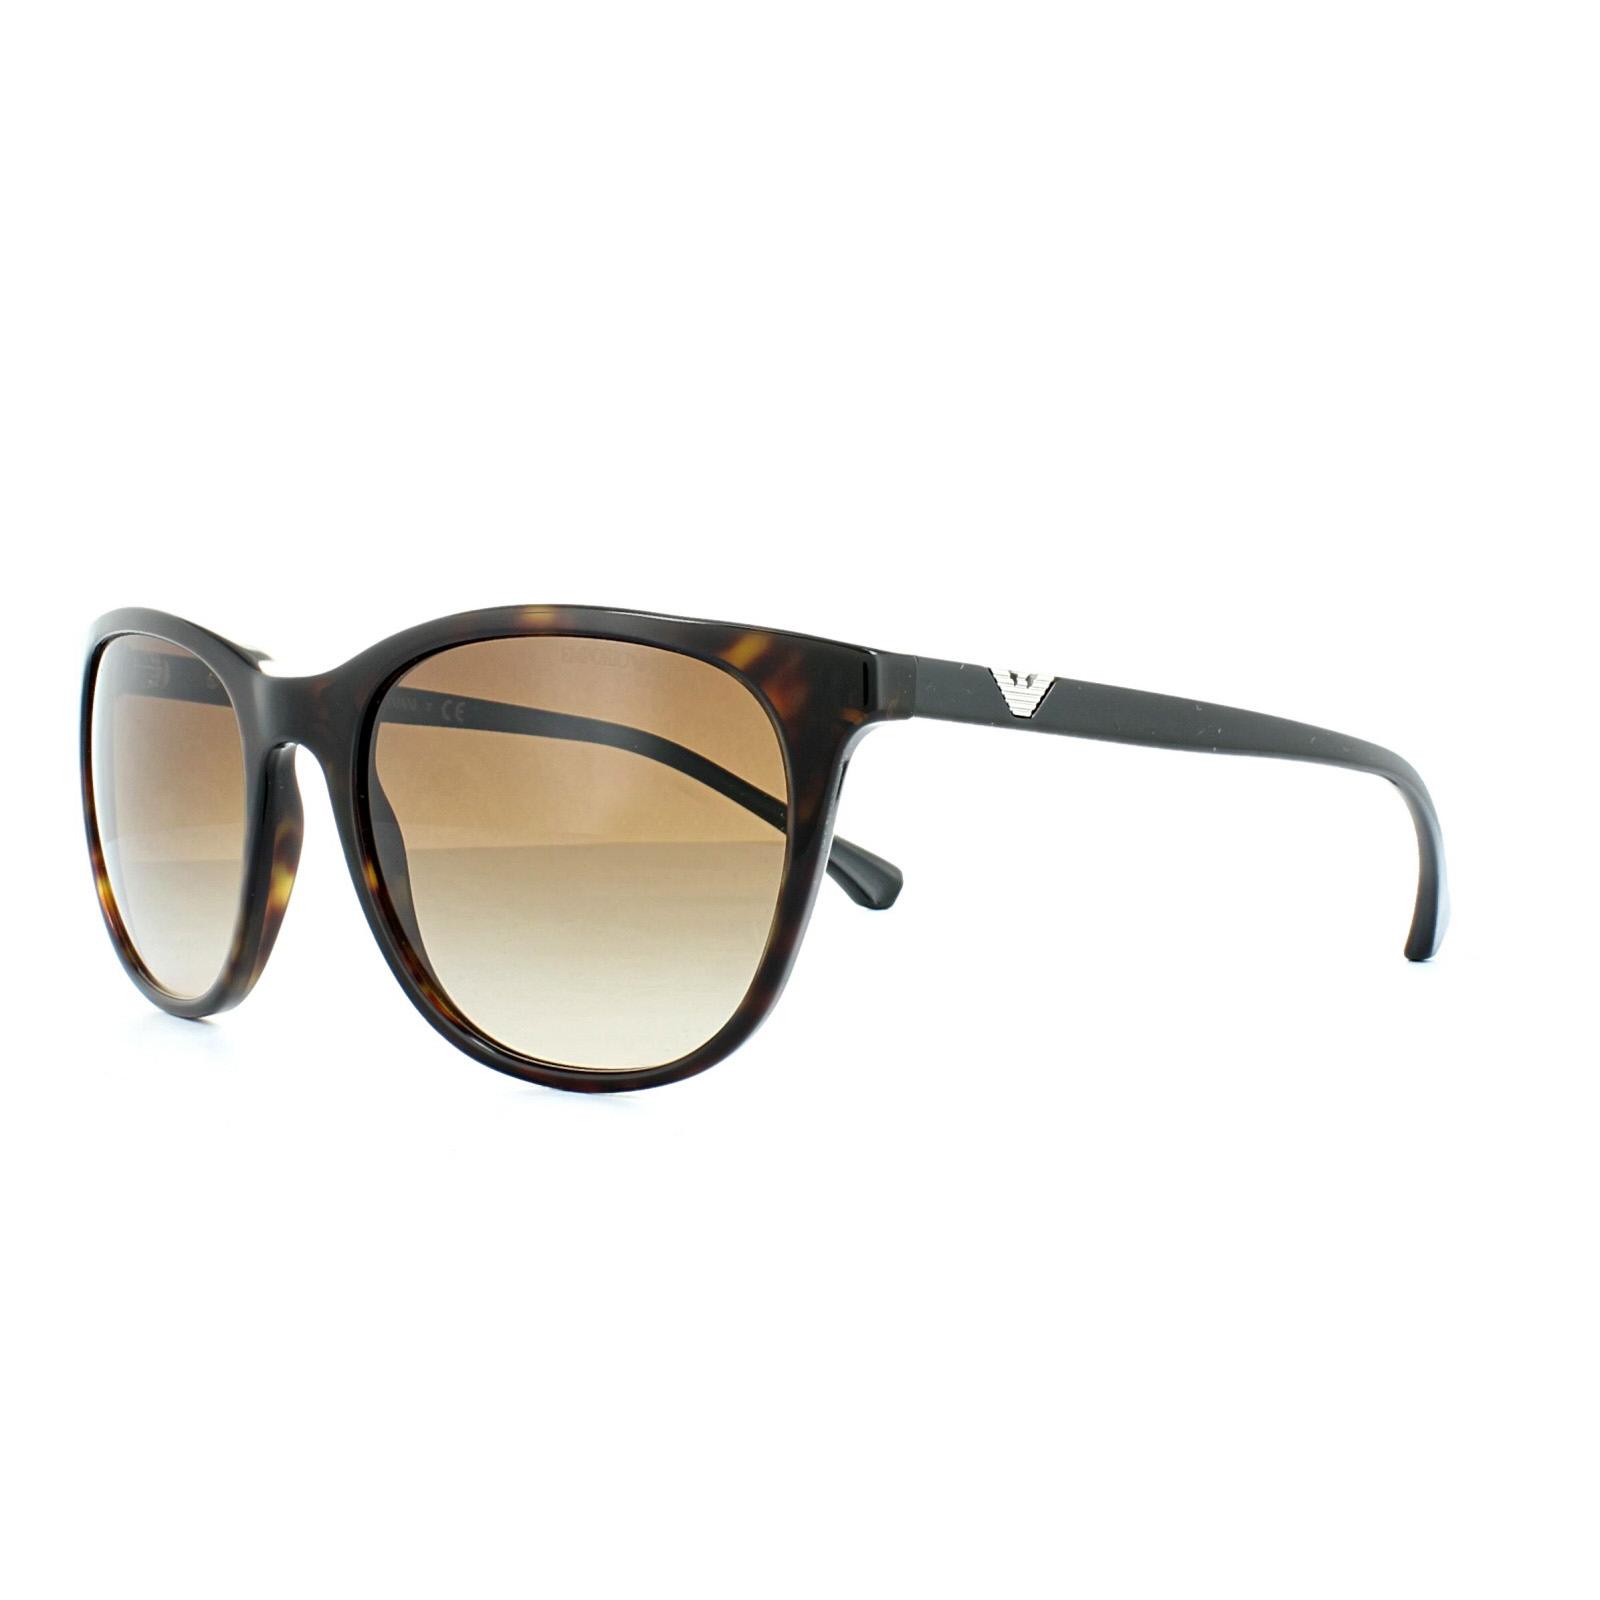 7be0ef0b0f2 Sentinel Emporio Armani Sunglasses 4086 5026 13 Dark Havana Brown Gradient